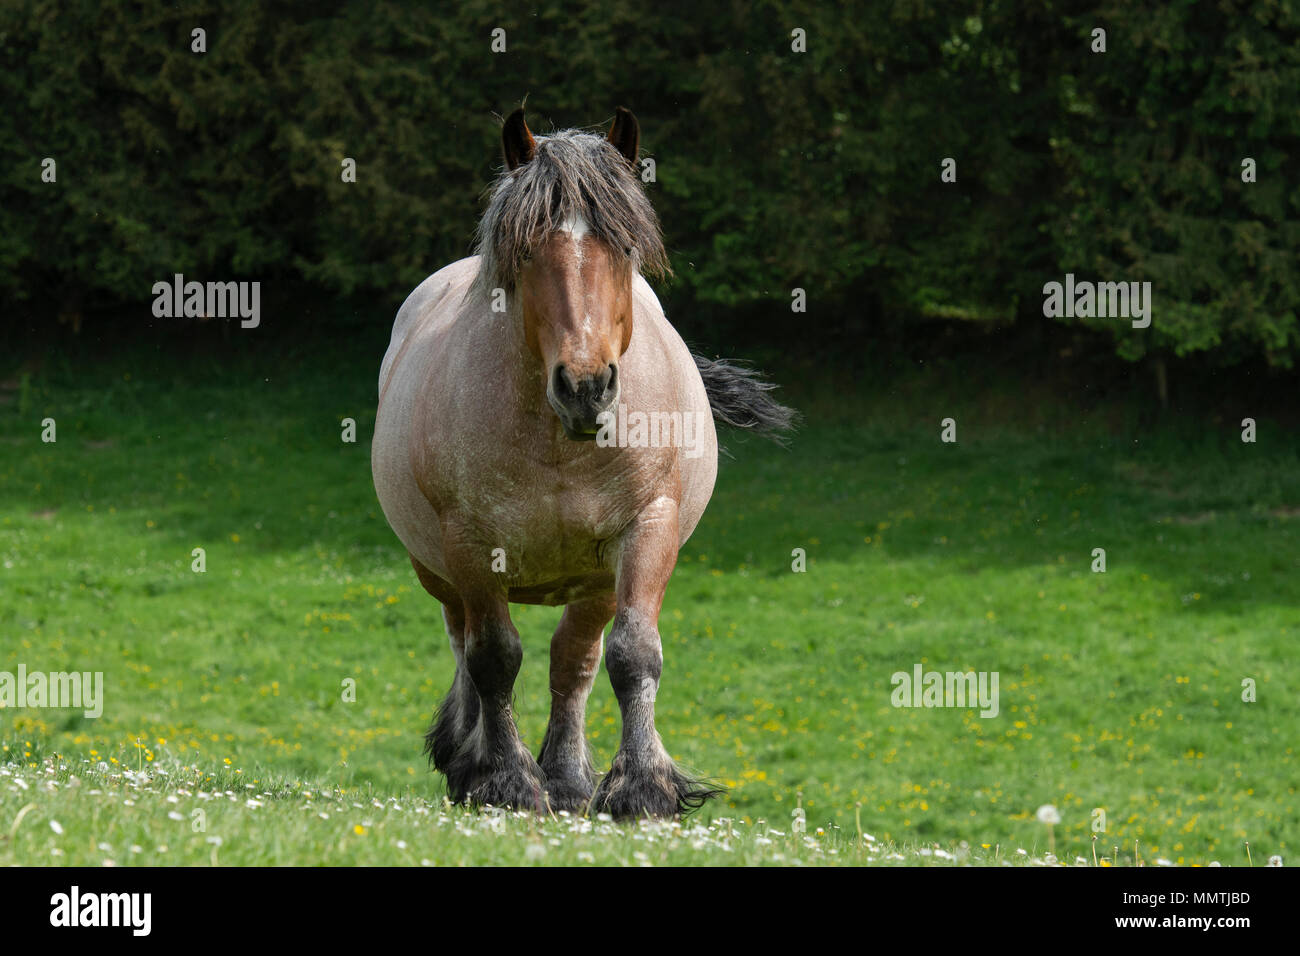 belgian draft horse - Stock Image